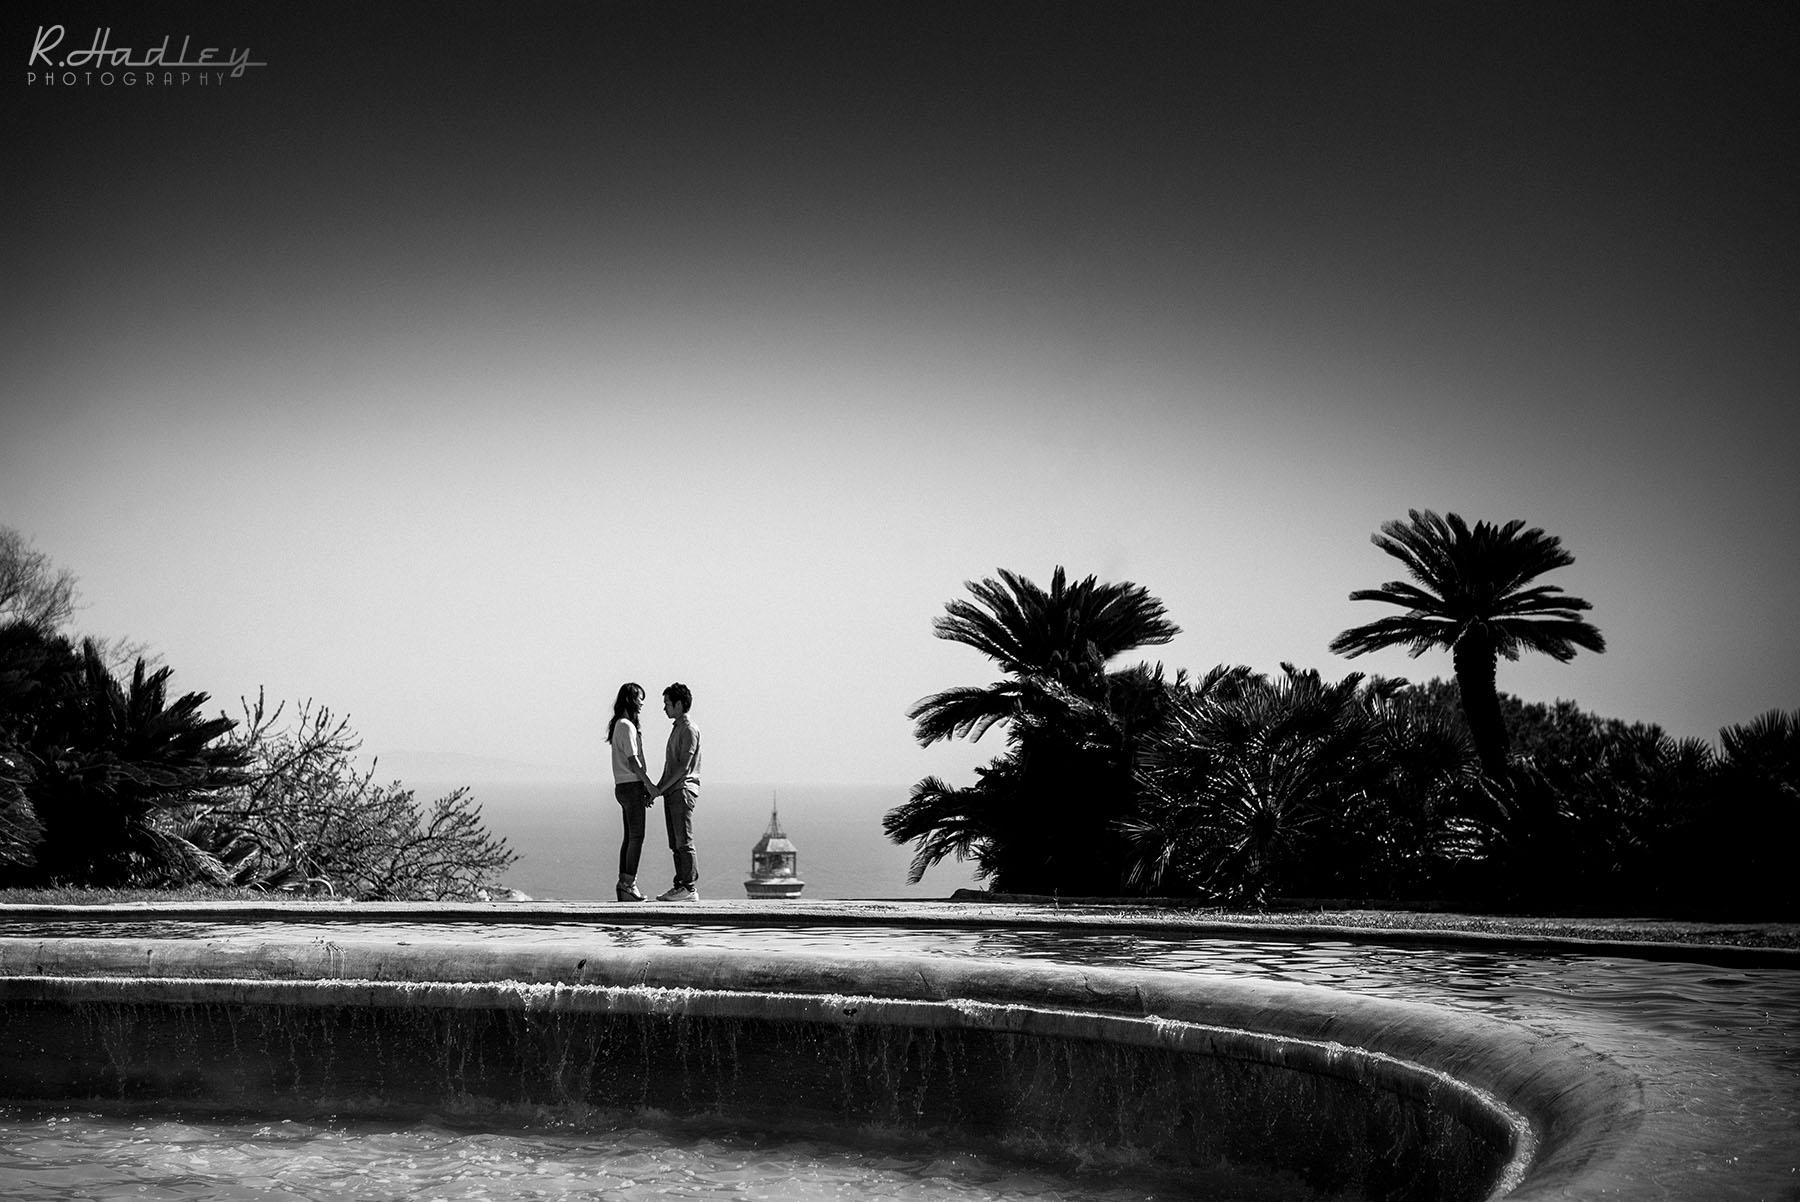 Portrait & engagement photo shoot in Barcelona at Montjuic Castle